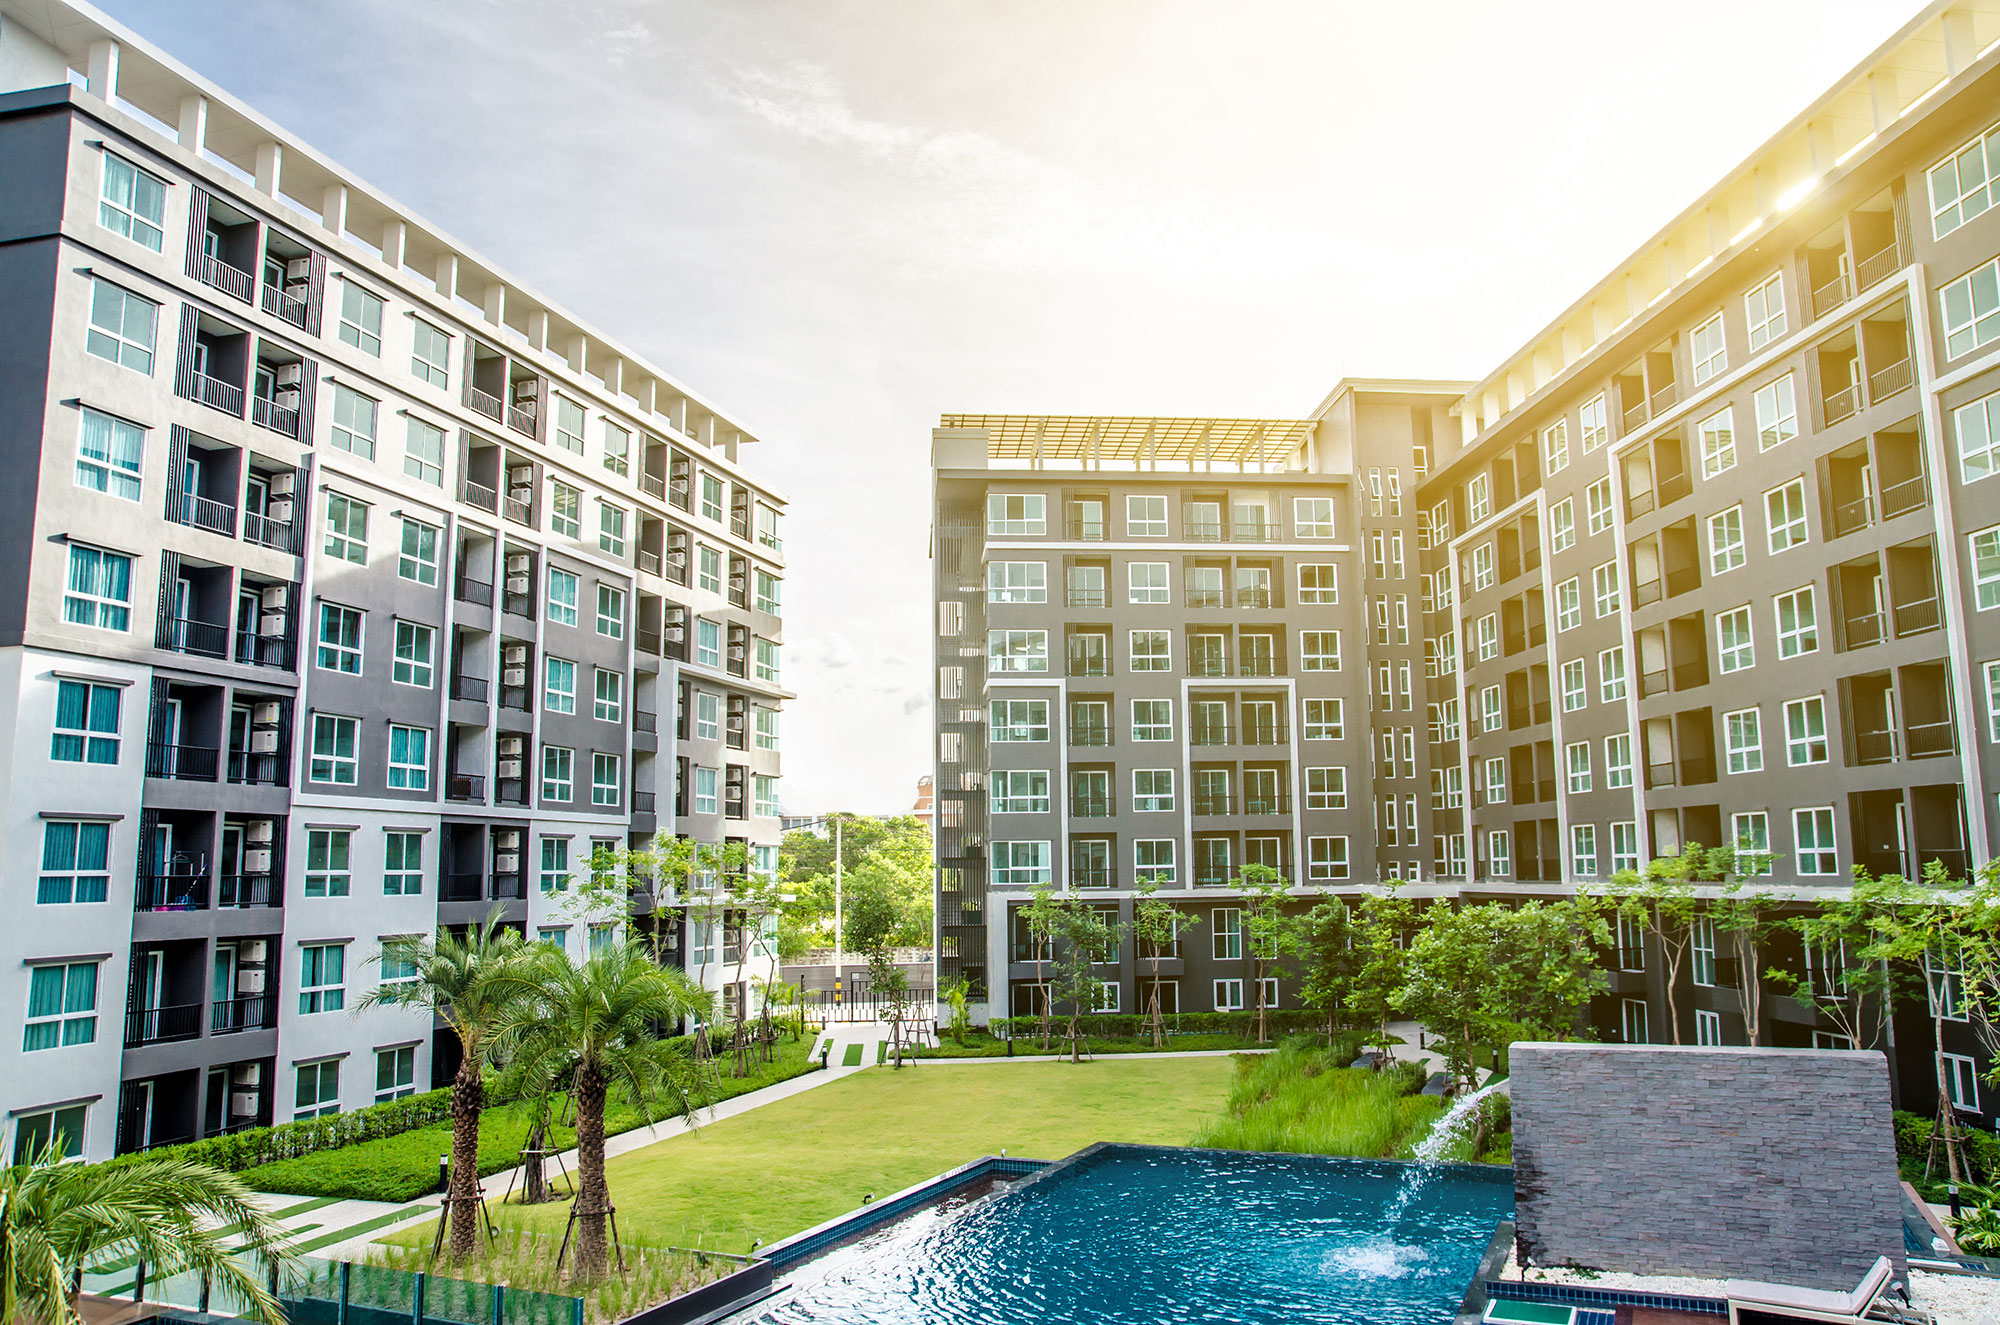 multi family housing complex